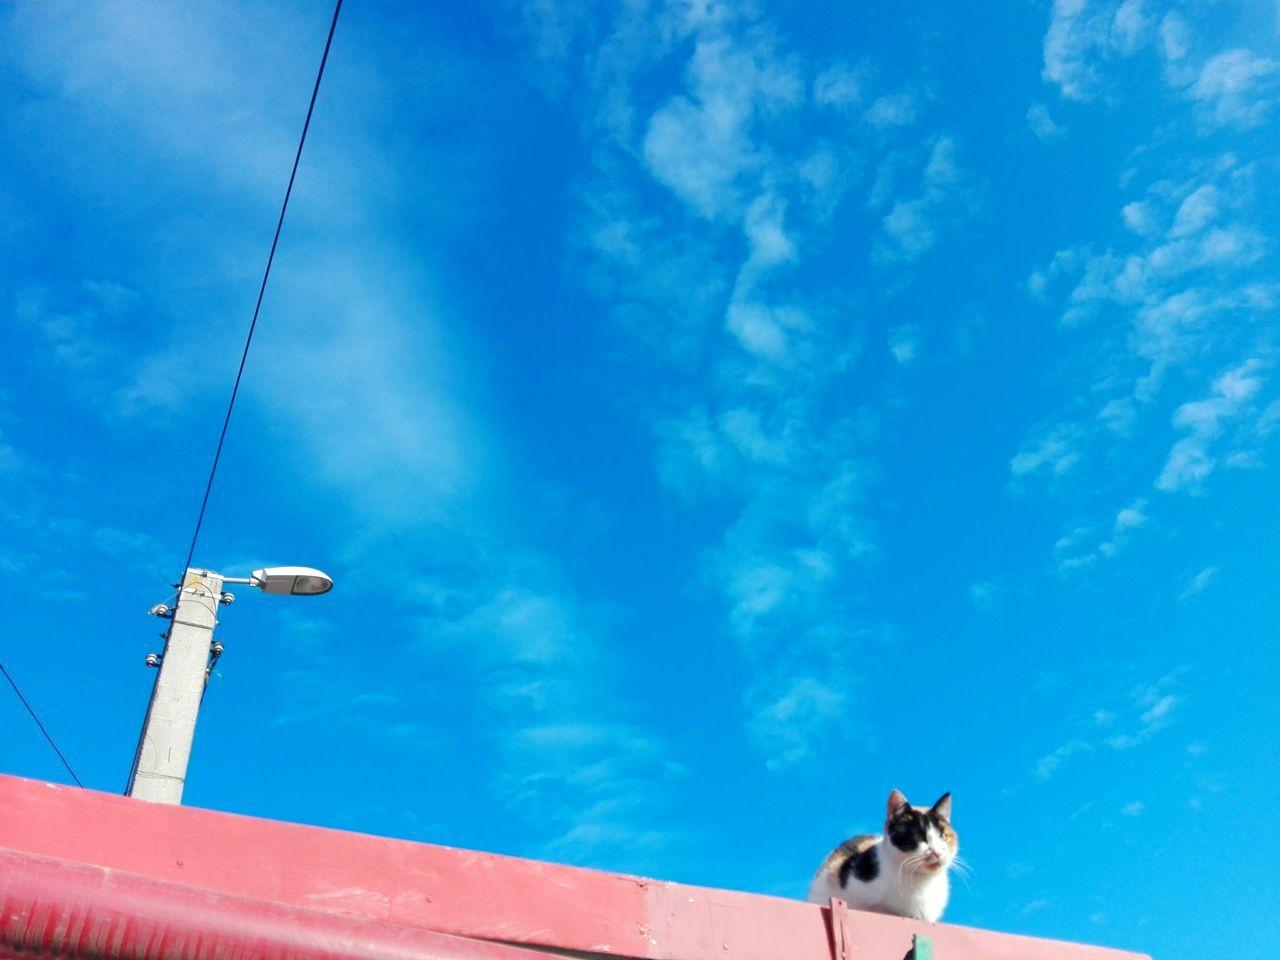 EyeEm Selects Cat On Red Roof Cat Cats Of EyeEm Calico Cat Cat On Rooftop Blue Sky Cat On Rooftop Uppon Blue Sky Wolfzuachis Huawei Photography Ionita Veronica Eyeem Market @WOLFZUACHiV Veronica Ionita Huaweiphotography Wolfzuachiv On Market Edited By @wolfzuachis Roof Red Roof Blue Sky And Clouds Street Lamp Street Lamp Post